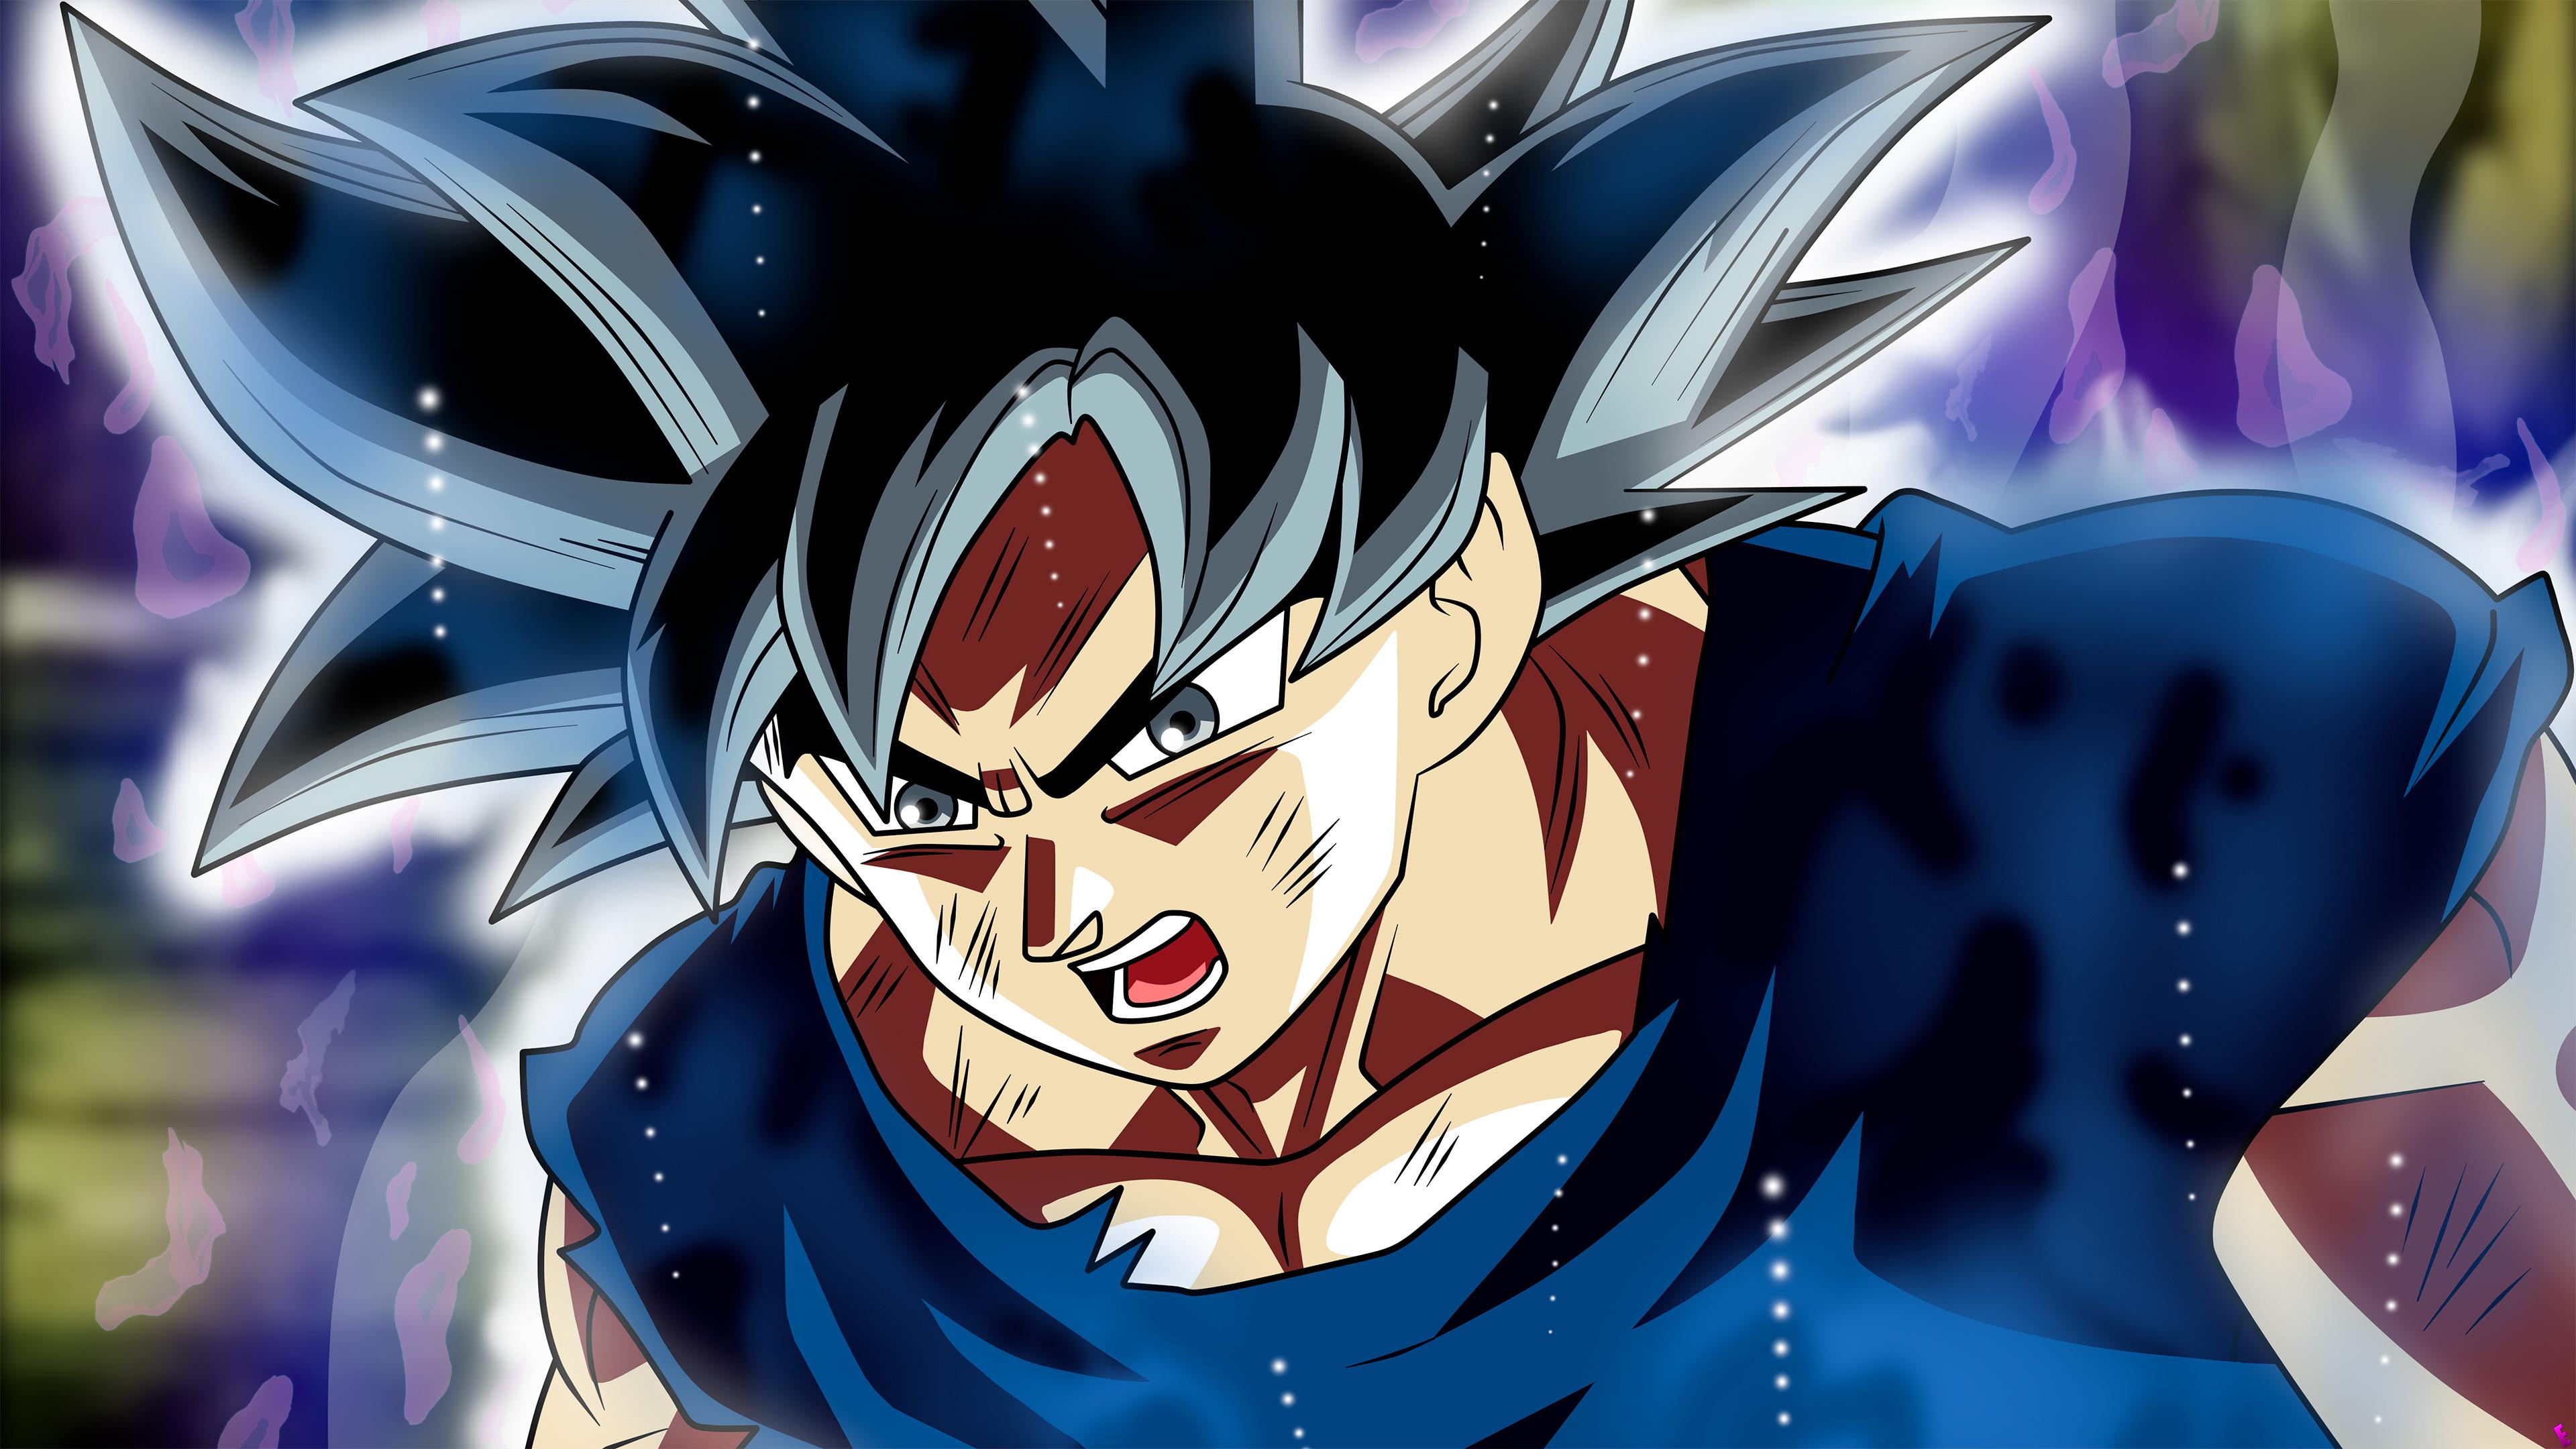 Anime 4k Wallpaper: 1366x768 Goku 4k 1366x768 Resolution HD 4k Wallpapers